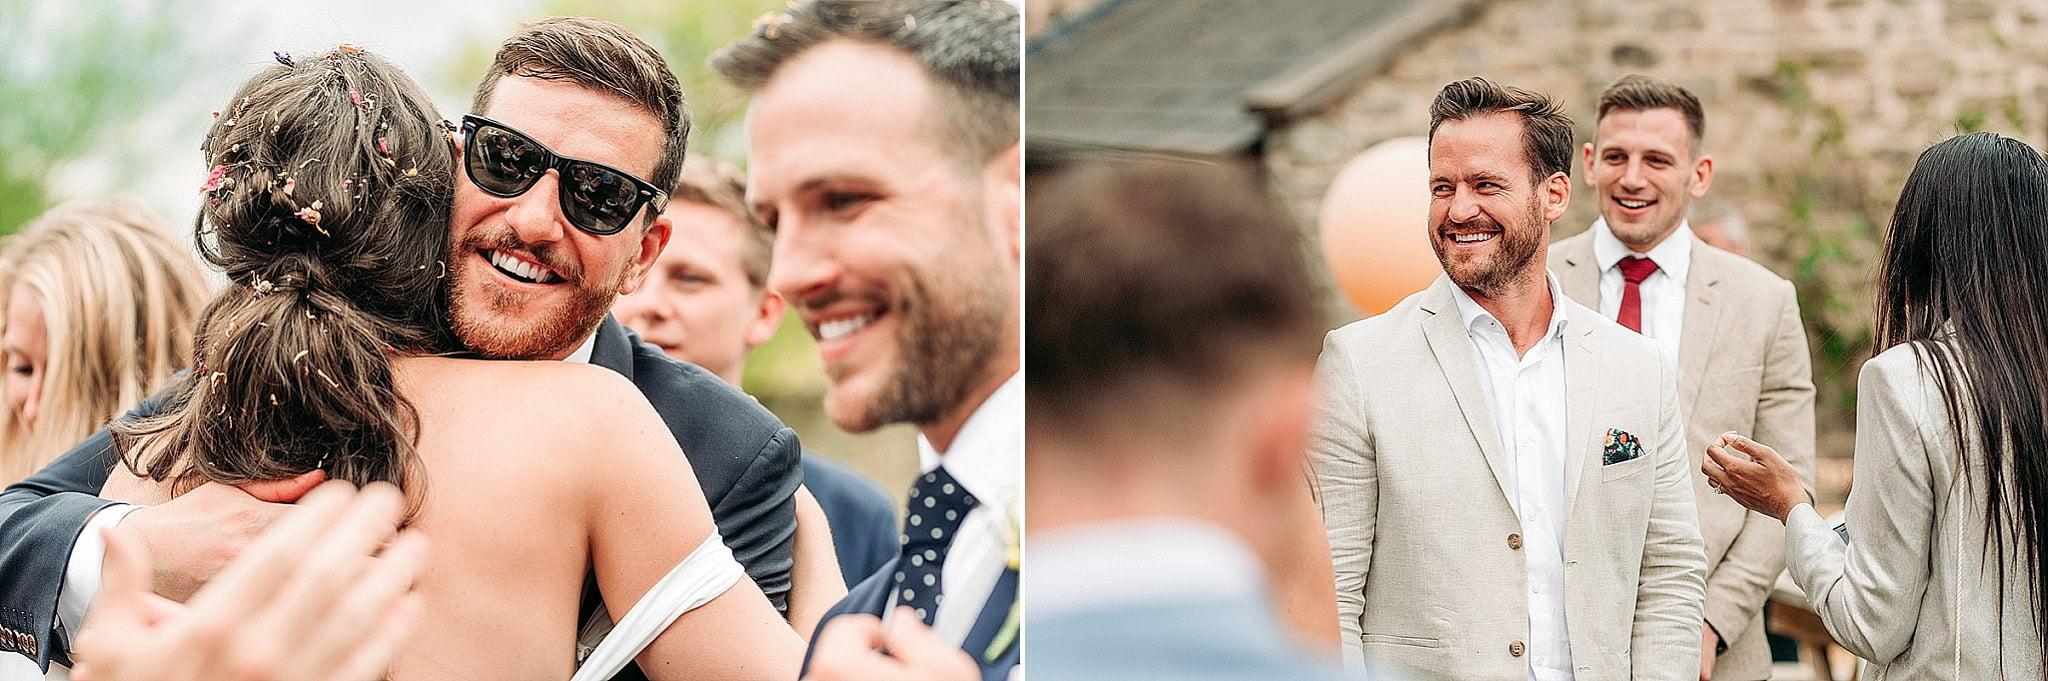 Lyde Court Wedding - Becky + Rhys 49